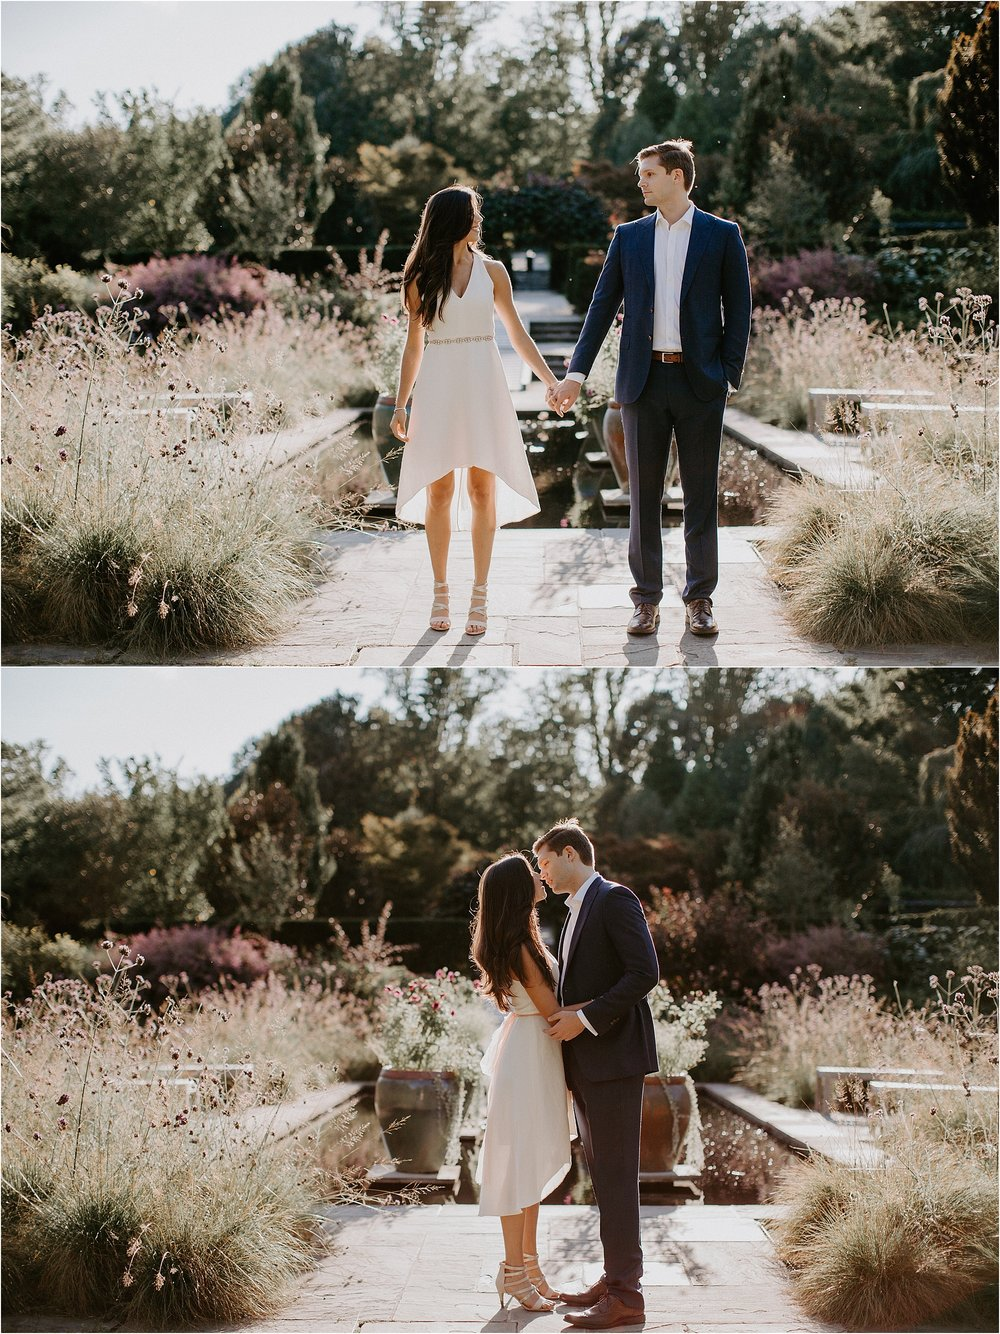 Sarah_Brookhart_Baltimore_Wedding_Photographer_0012.jpg